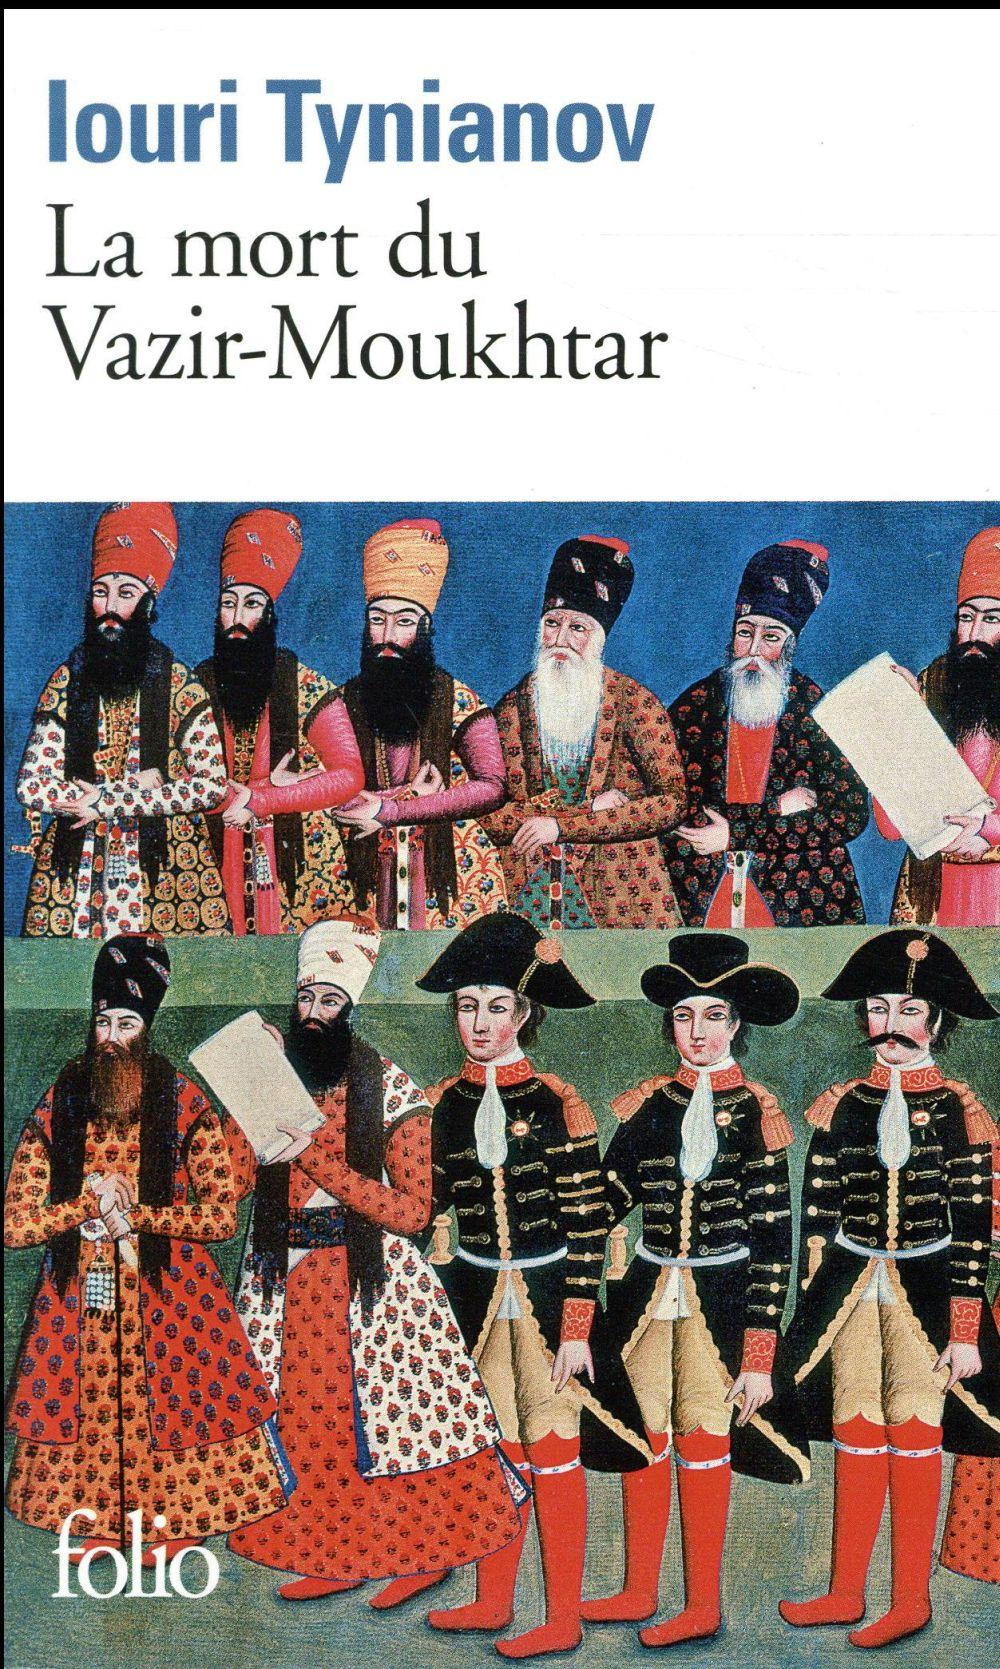 La mort du Vazir-Moukhtar